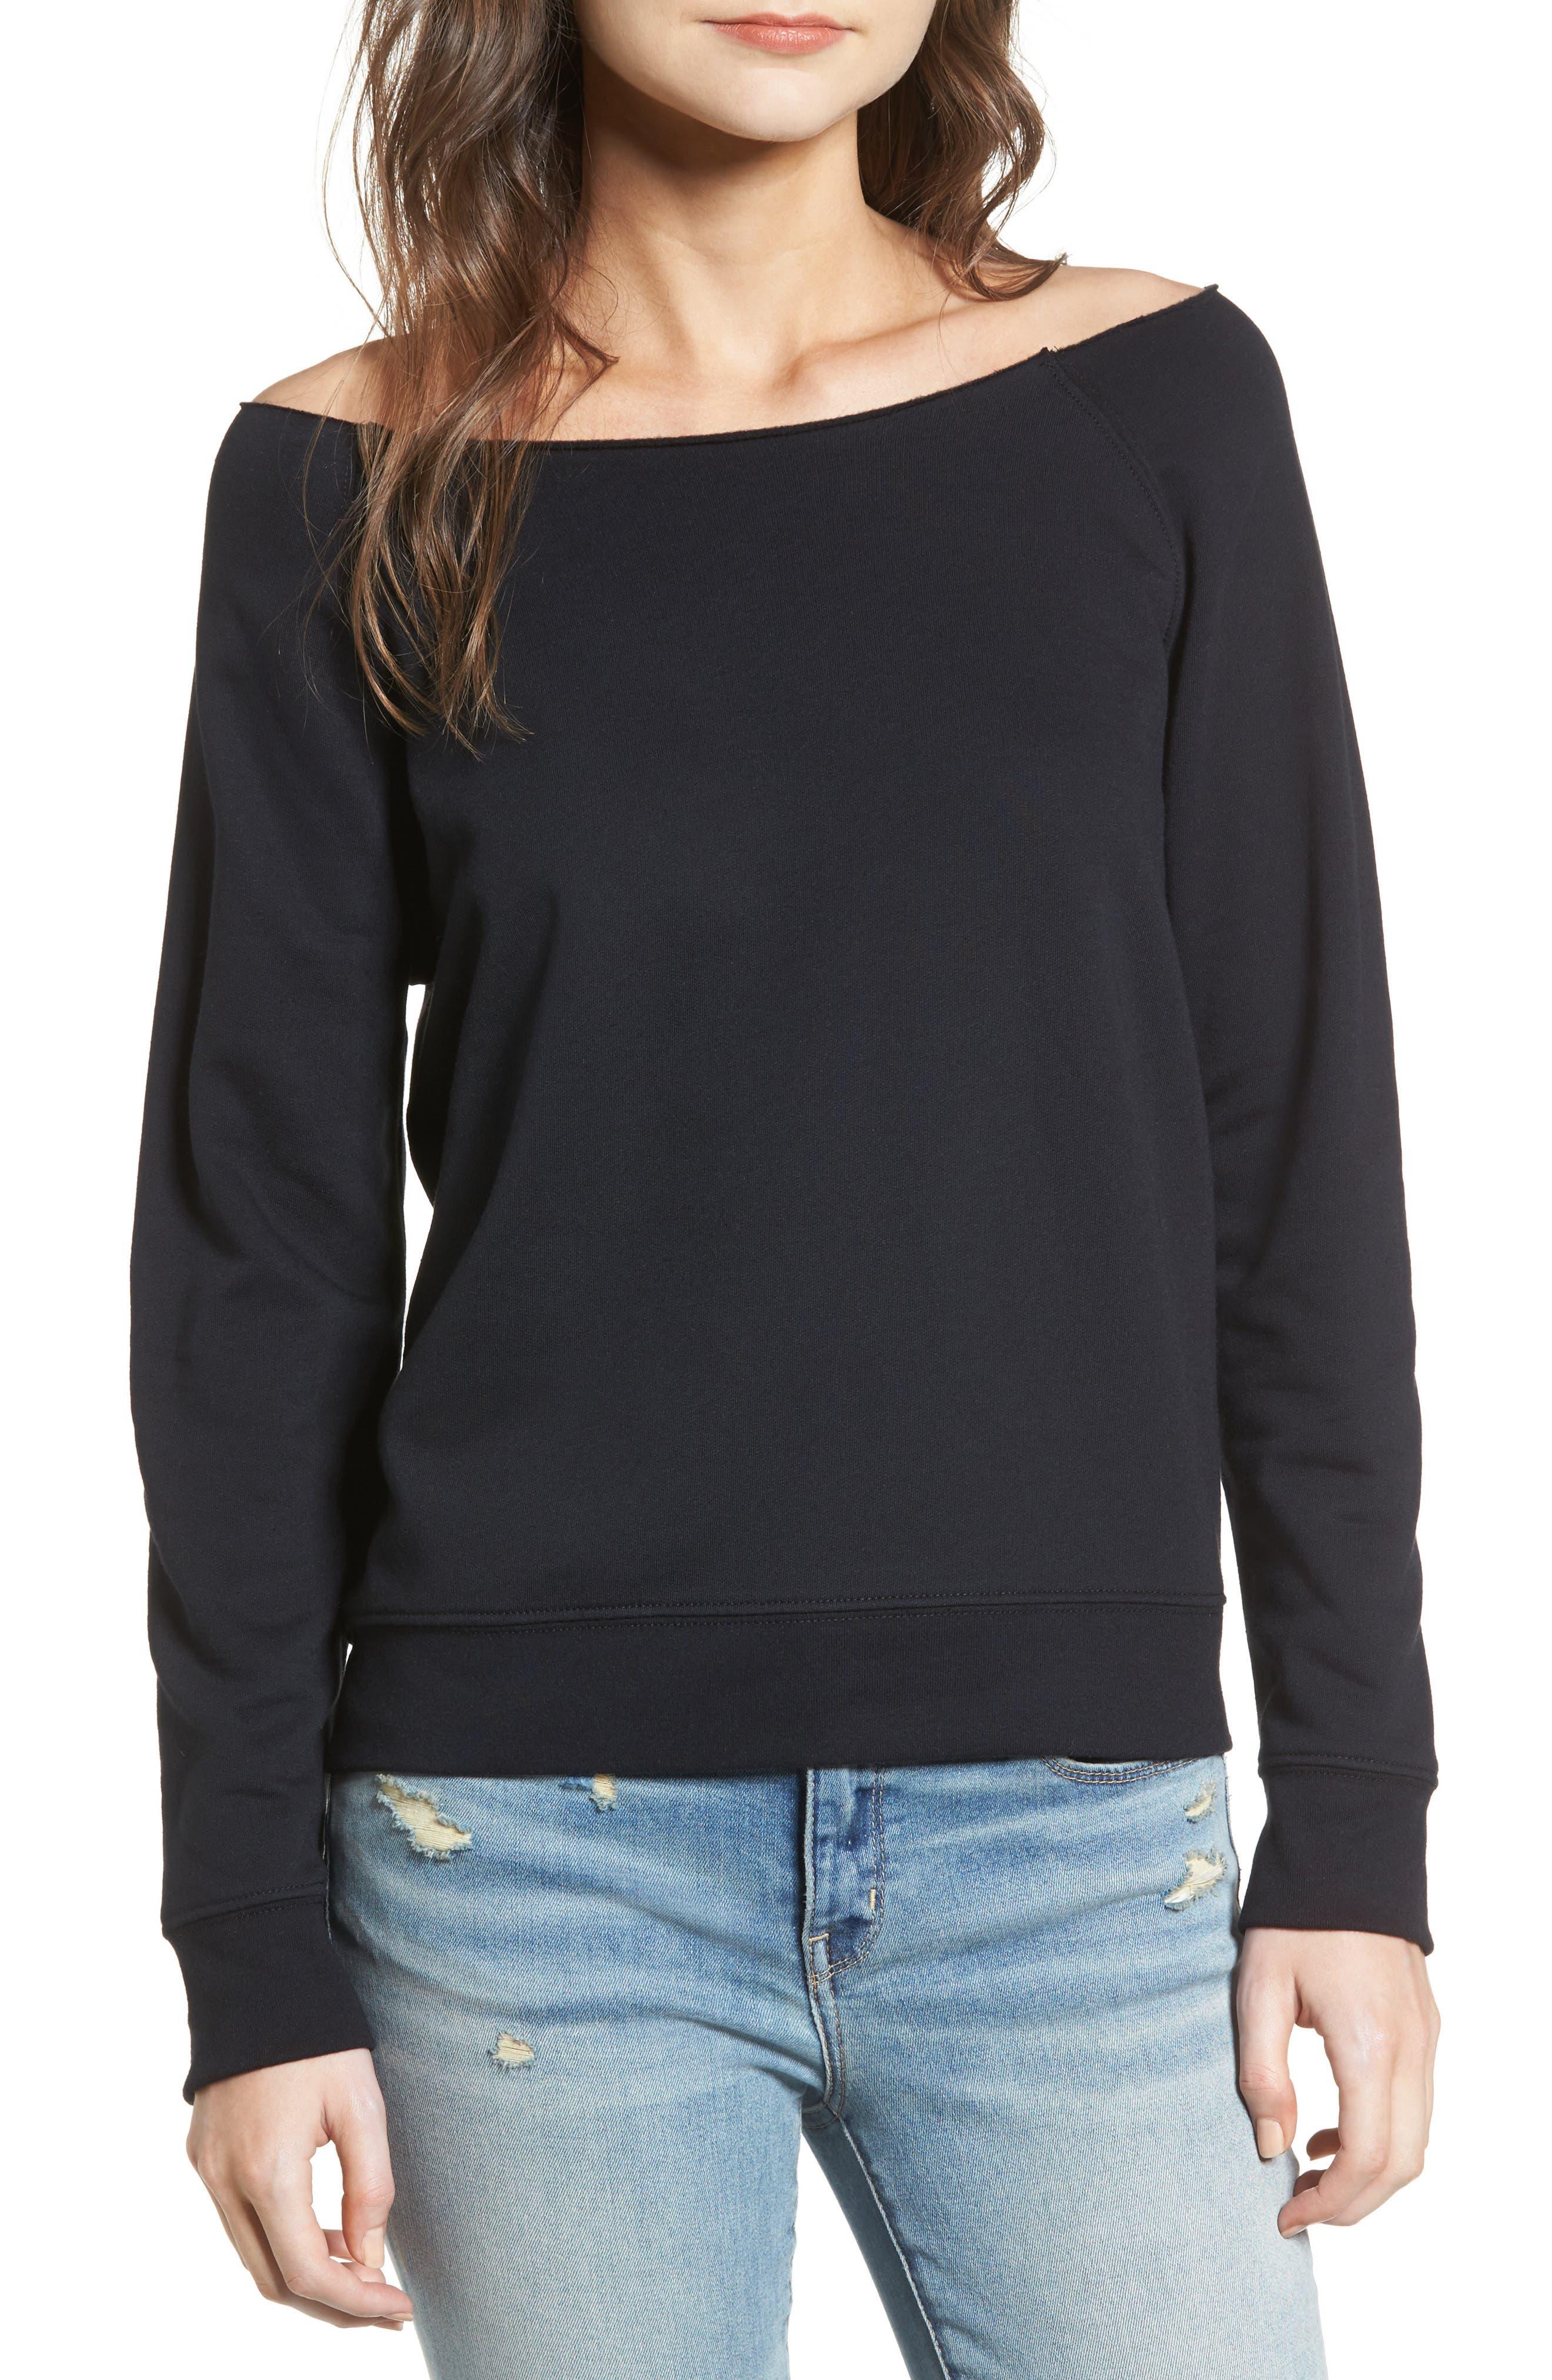 Treasure & Bond Raw Neck Sweatshirt